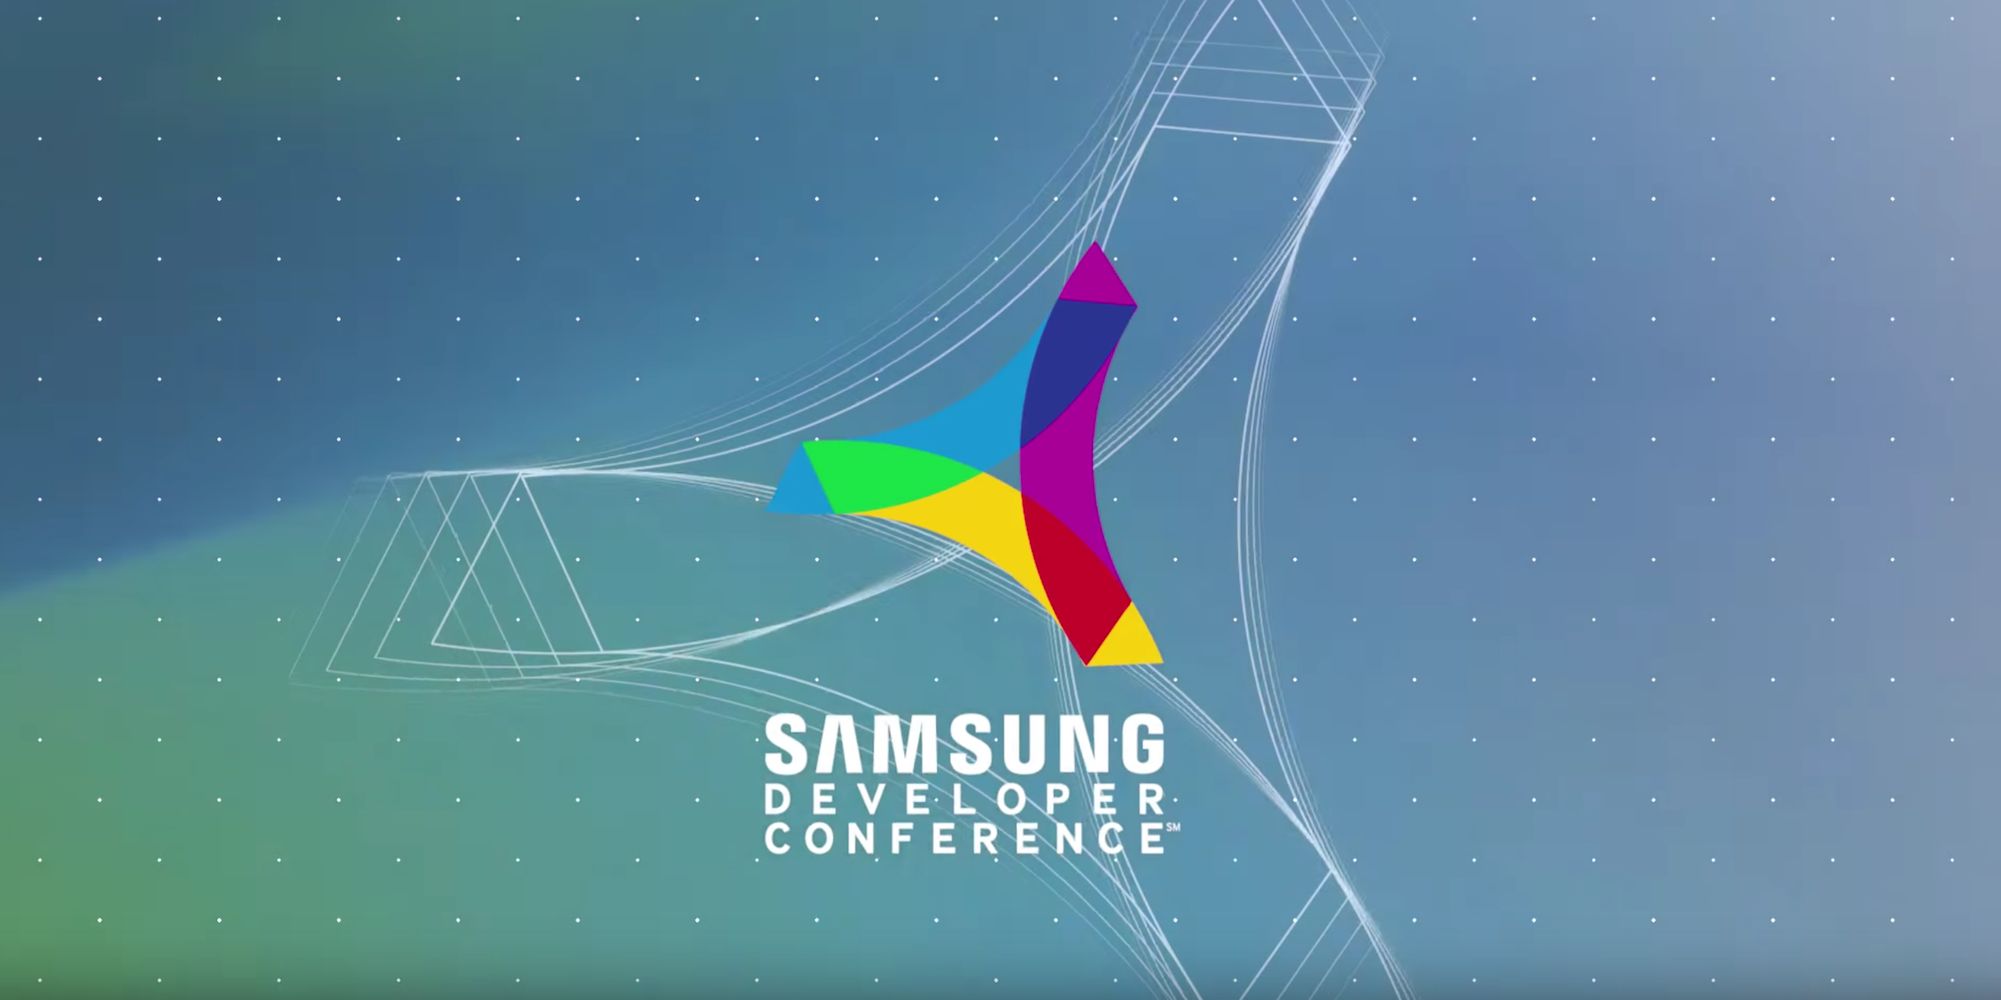 Samsung-Dev-Conference-2016